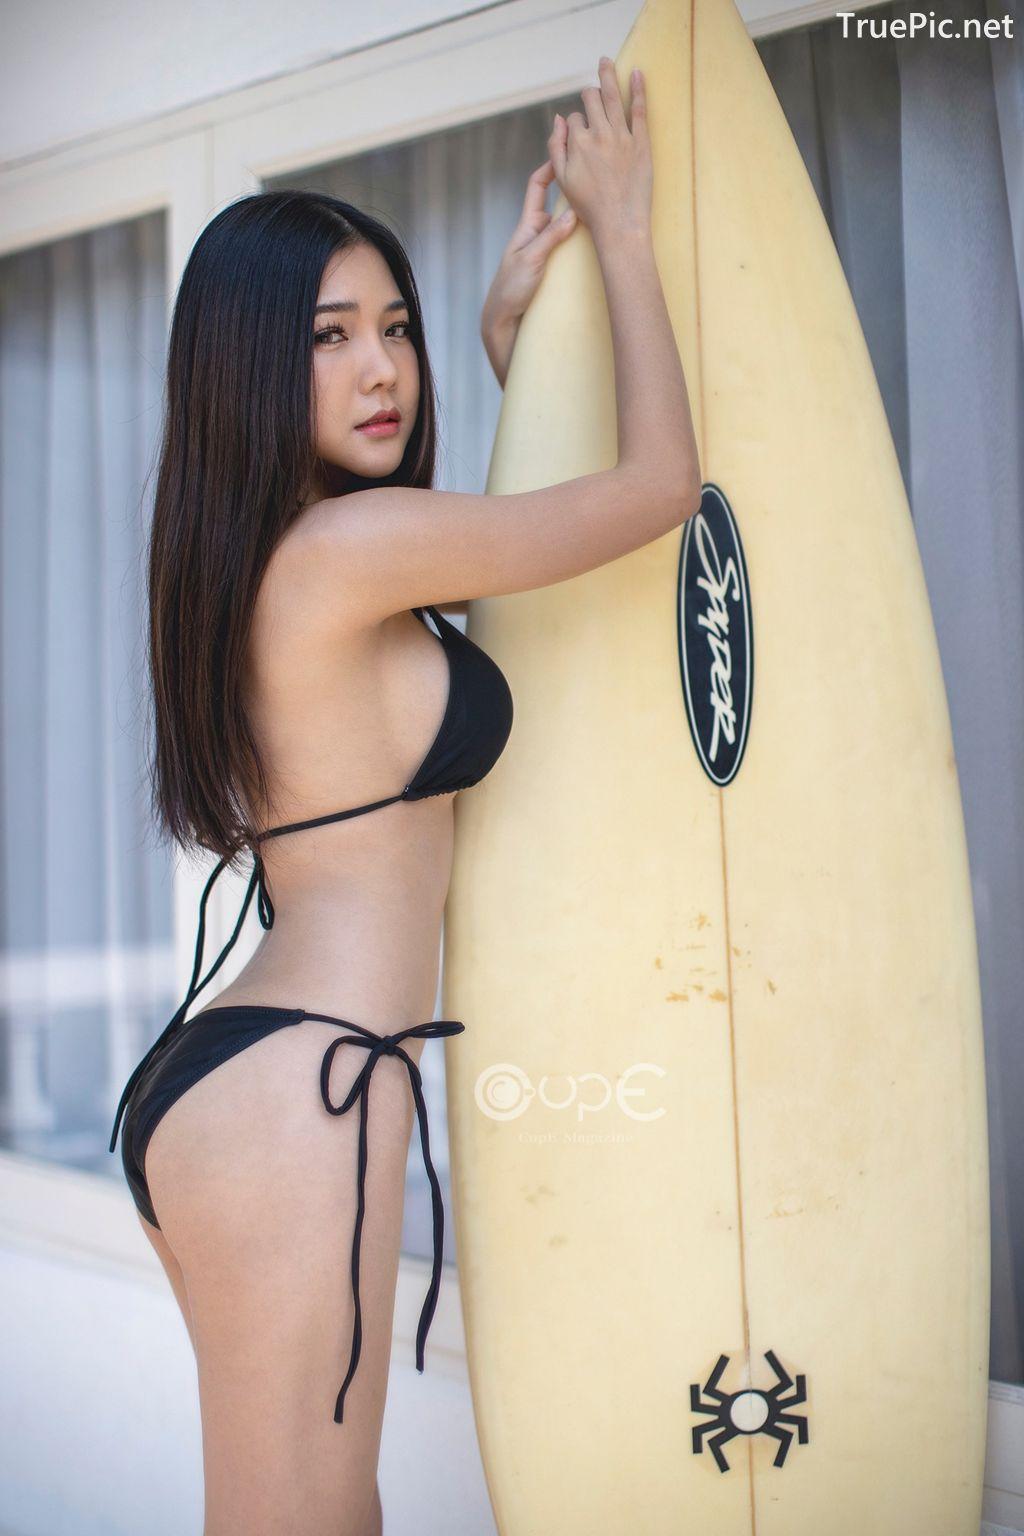 Image-Thailand-Model-Phitchamol-Srijantanet-Black-Bikini-TruePic.net- Picture-3